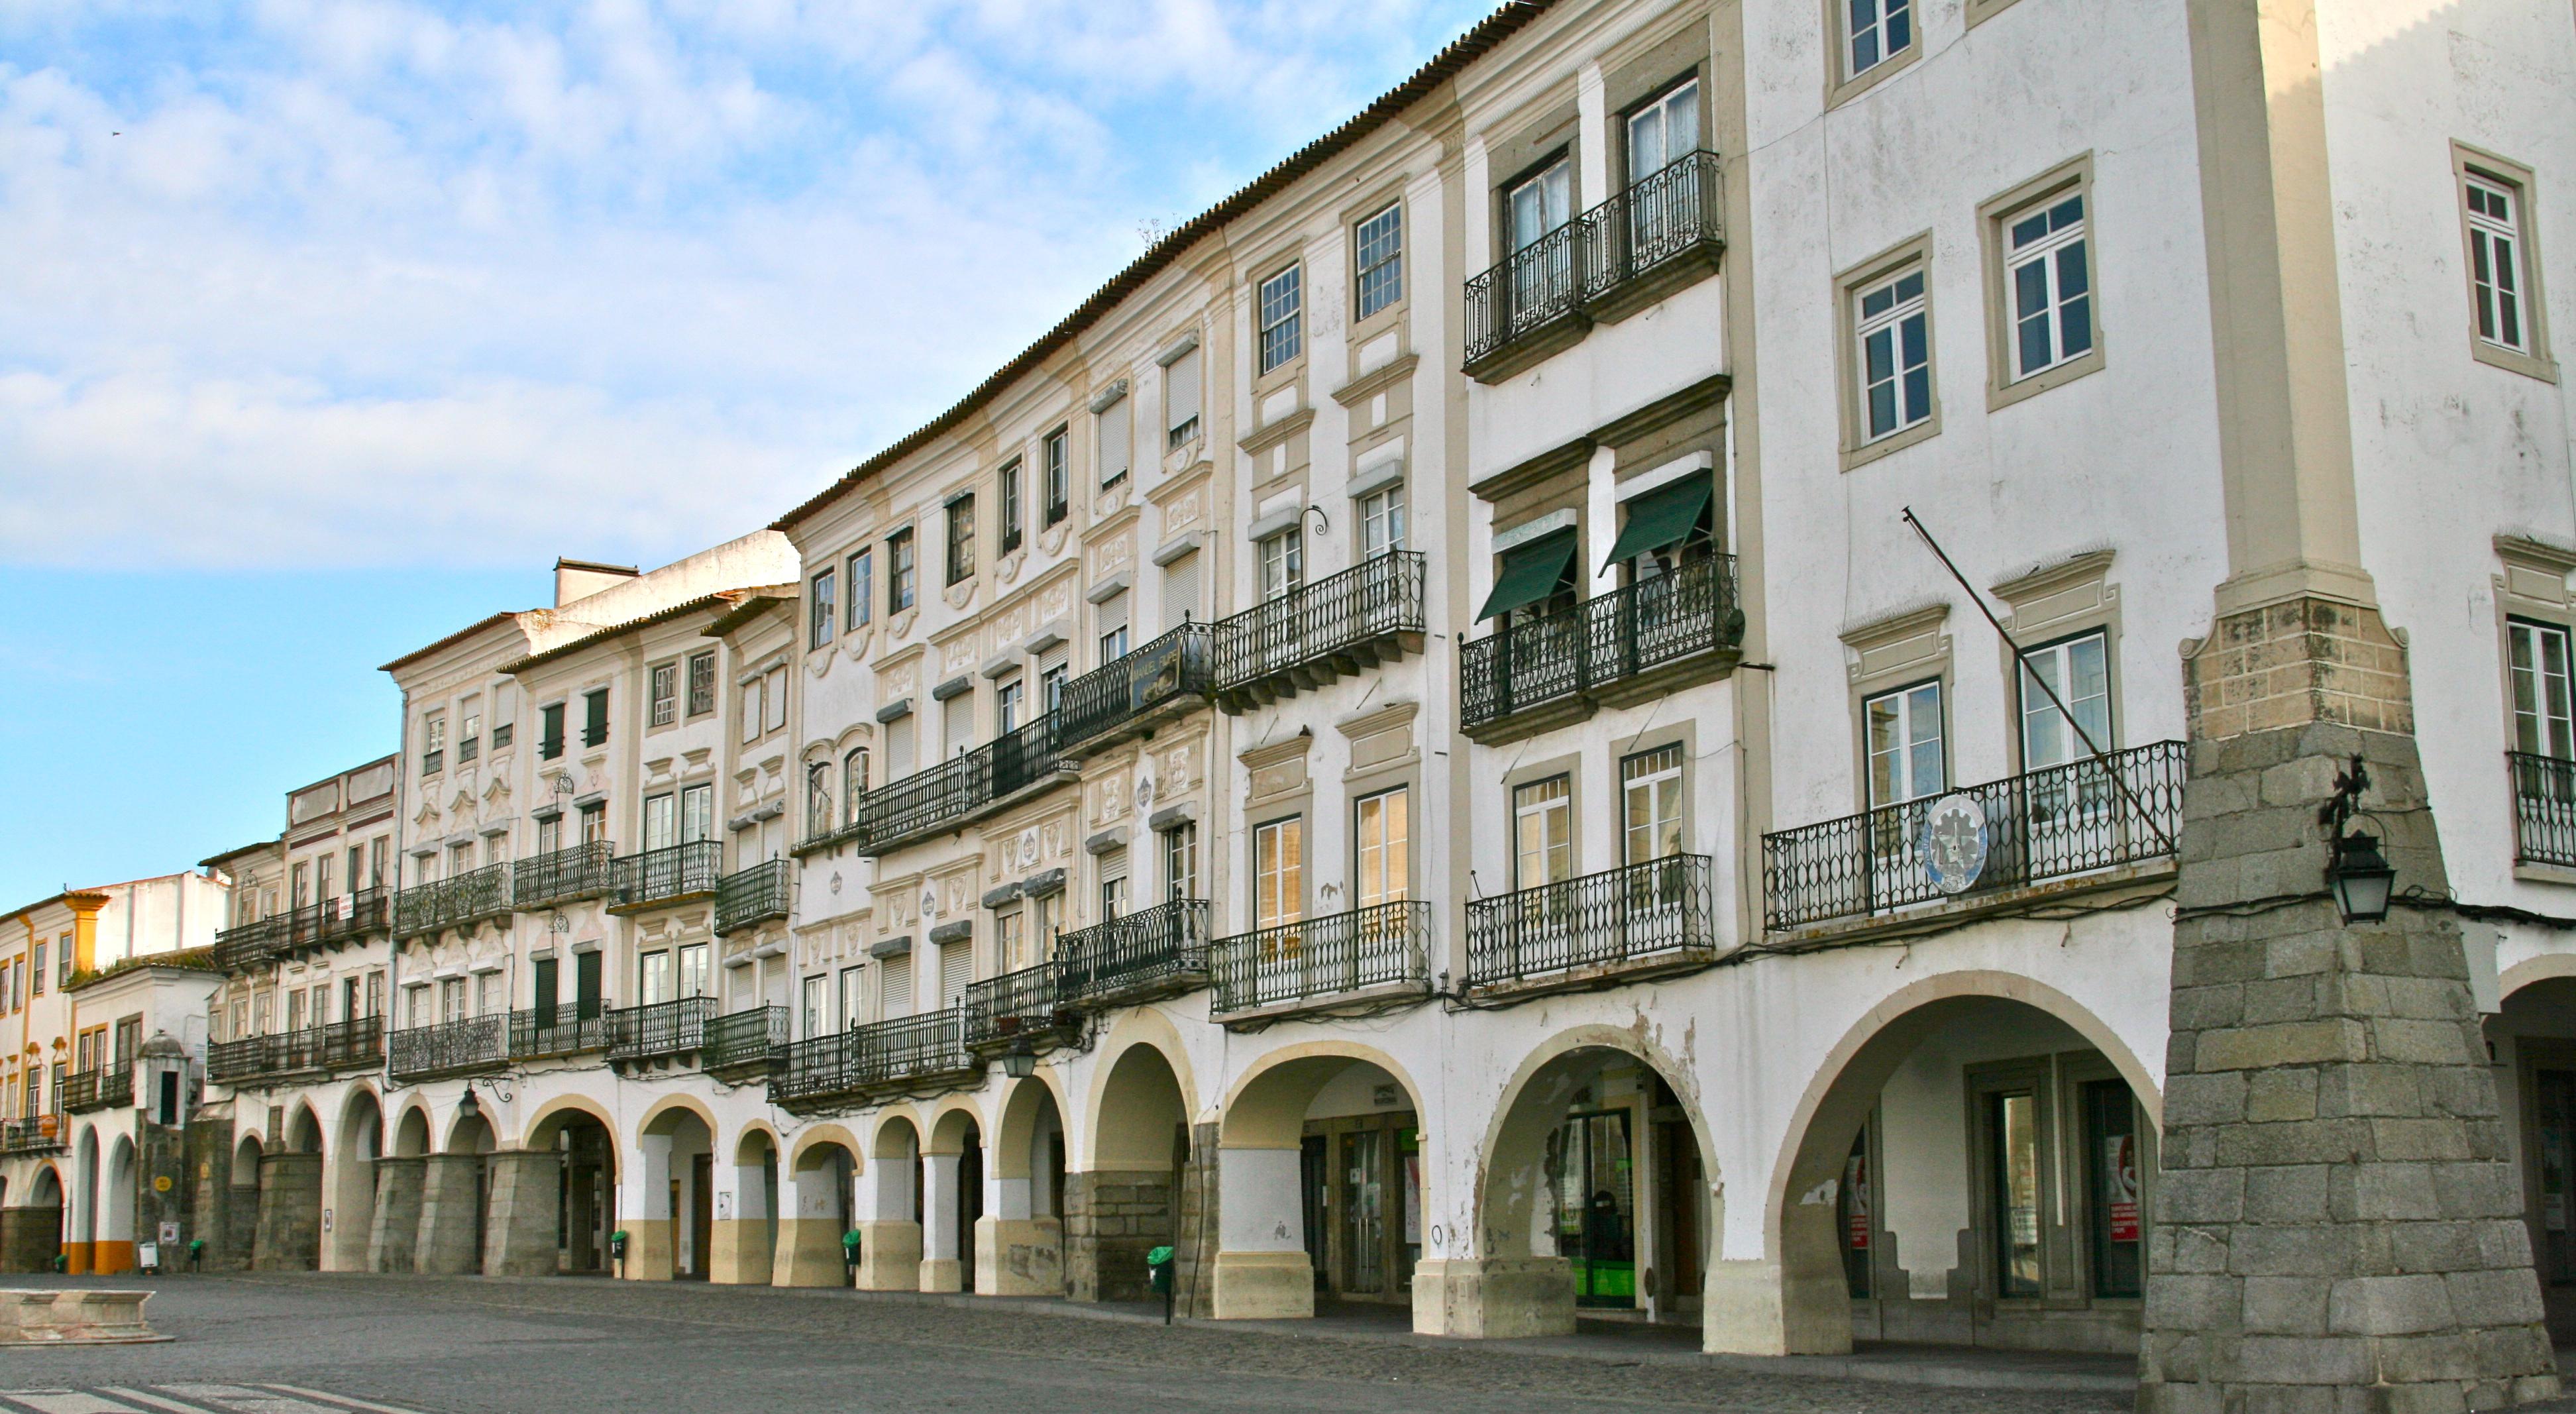 Pueblos de España que merecen ser visitados - Página 4 Pra%C3%A7a_de_Giraldo%2C_Evora_%2810250693386%29_%28cropped%29